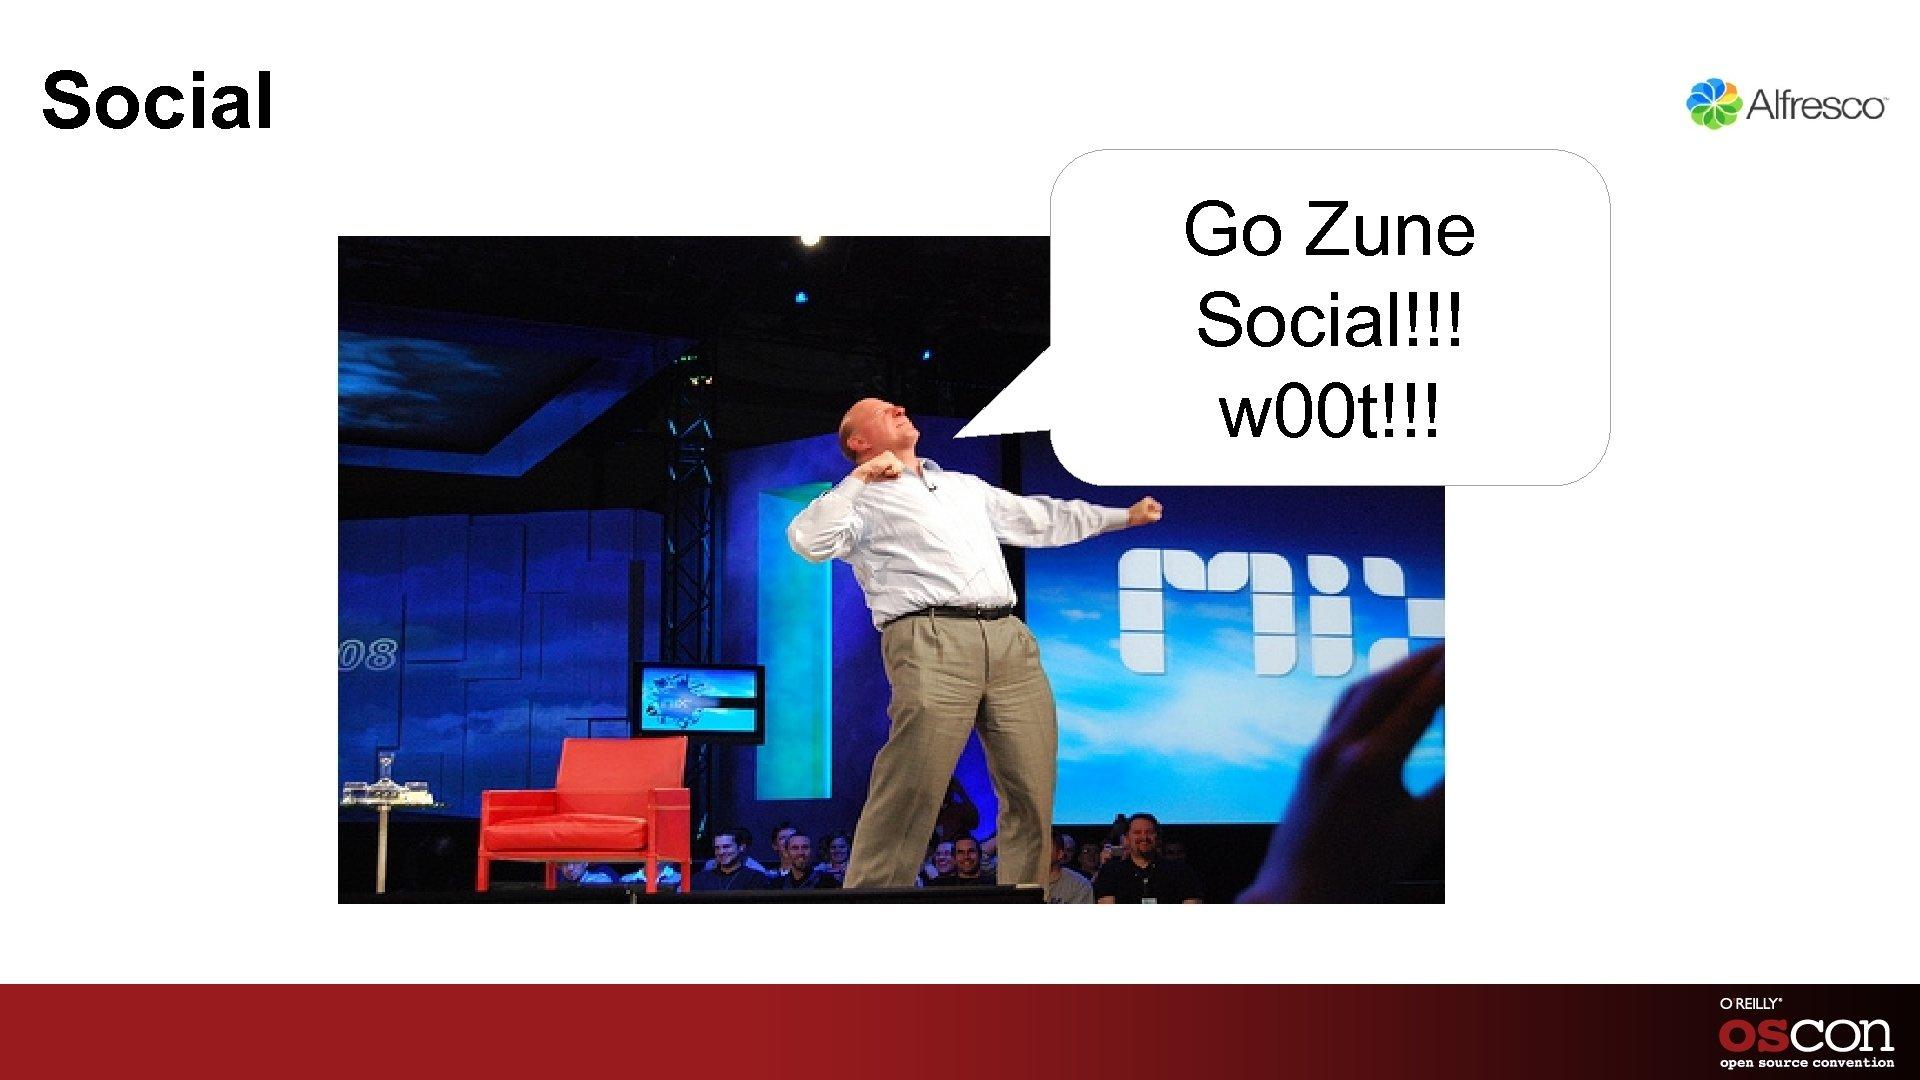 Social Go Zune Social!!! w 00 t!!!